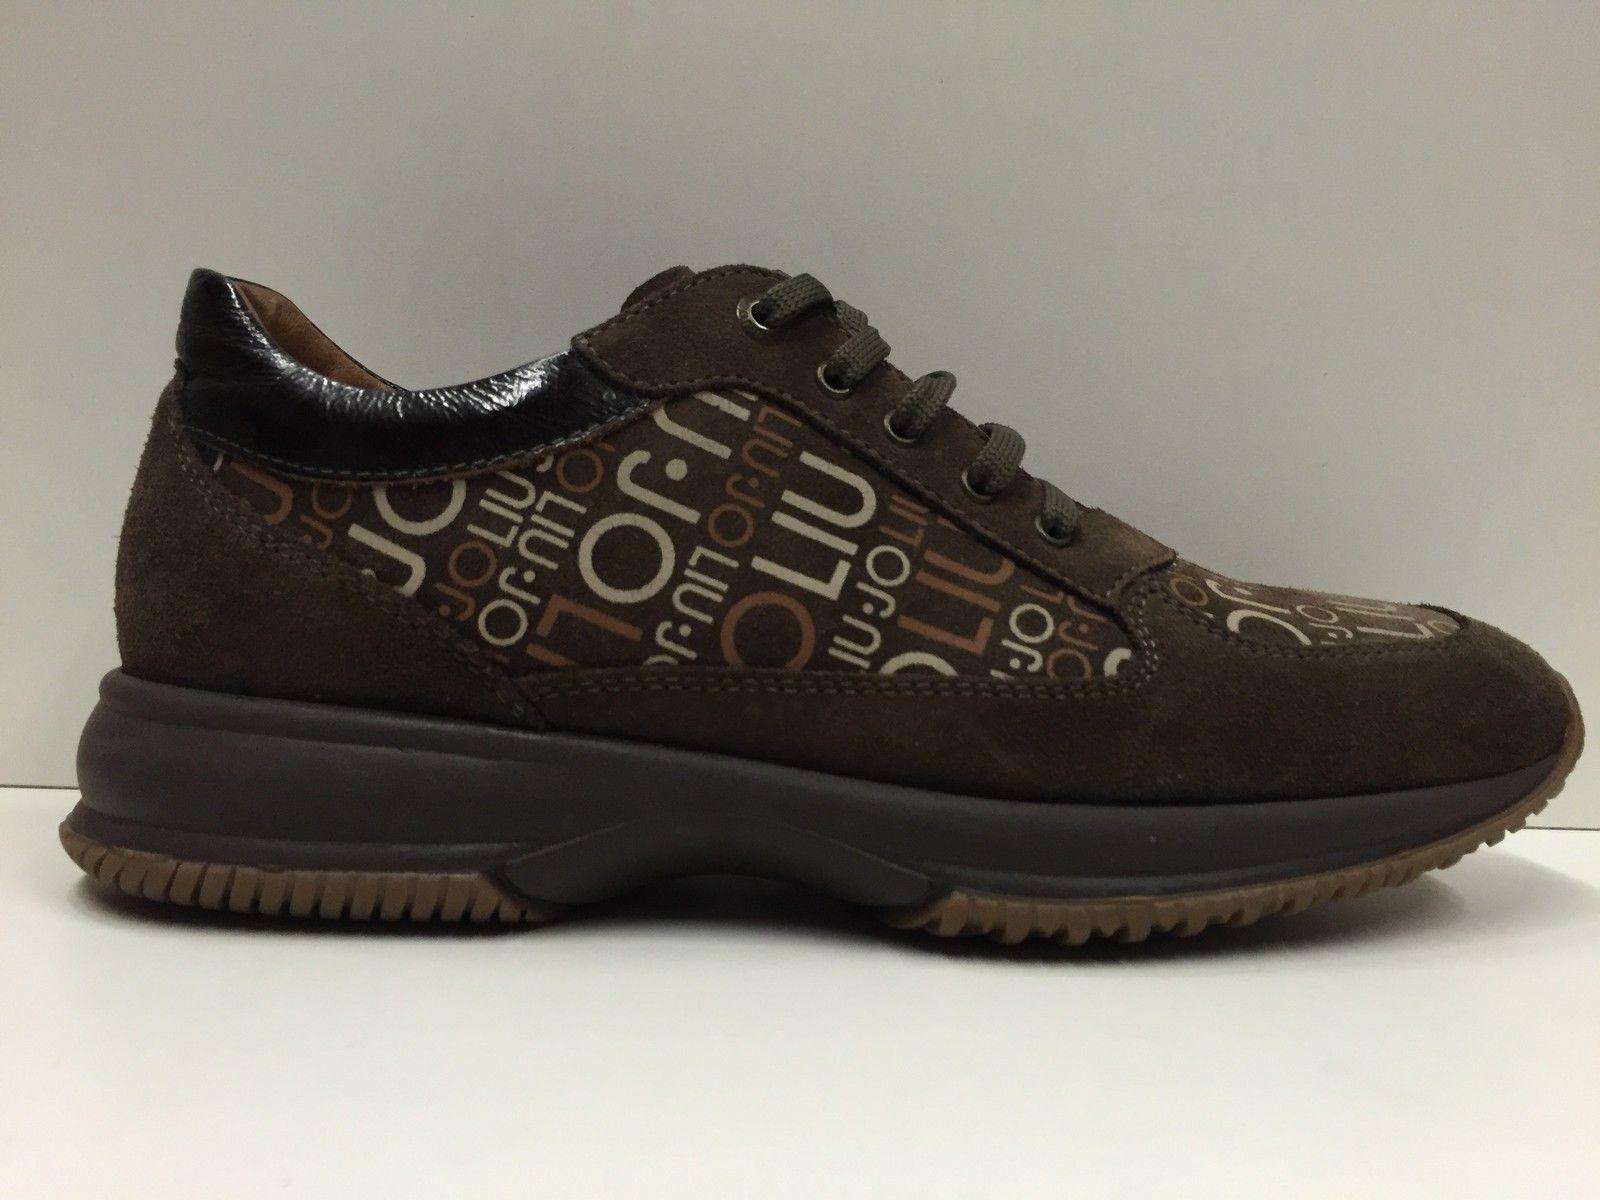 SCARPE CASUAL PELLE DONNA LIU JO ORIGINALI FUB1687 PELLE CASUAL scarpe Pelle   c74984